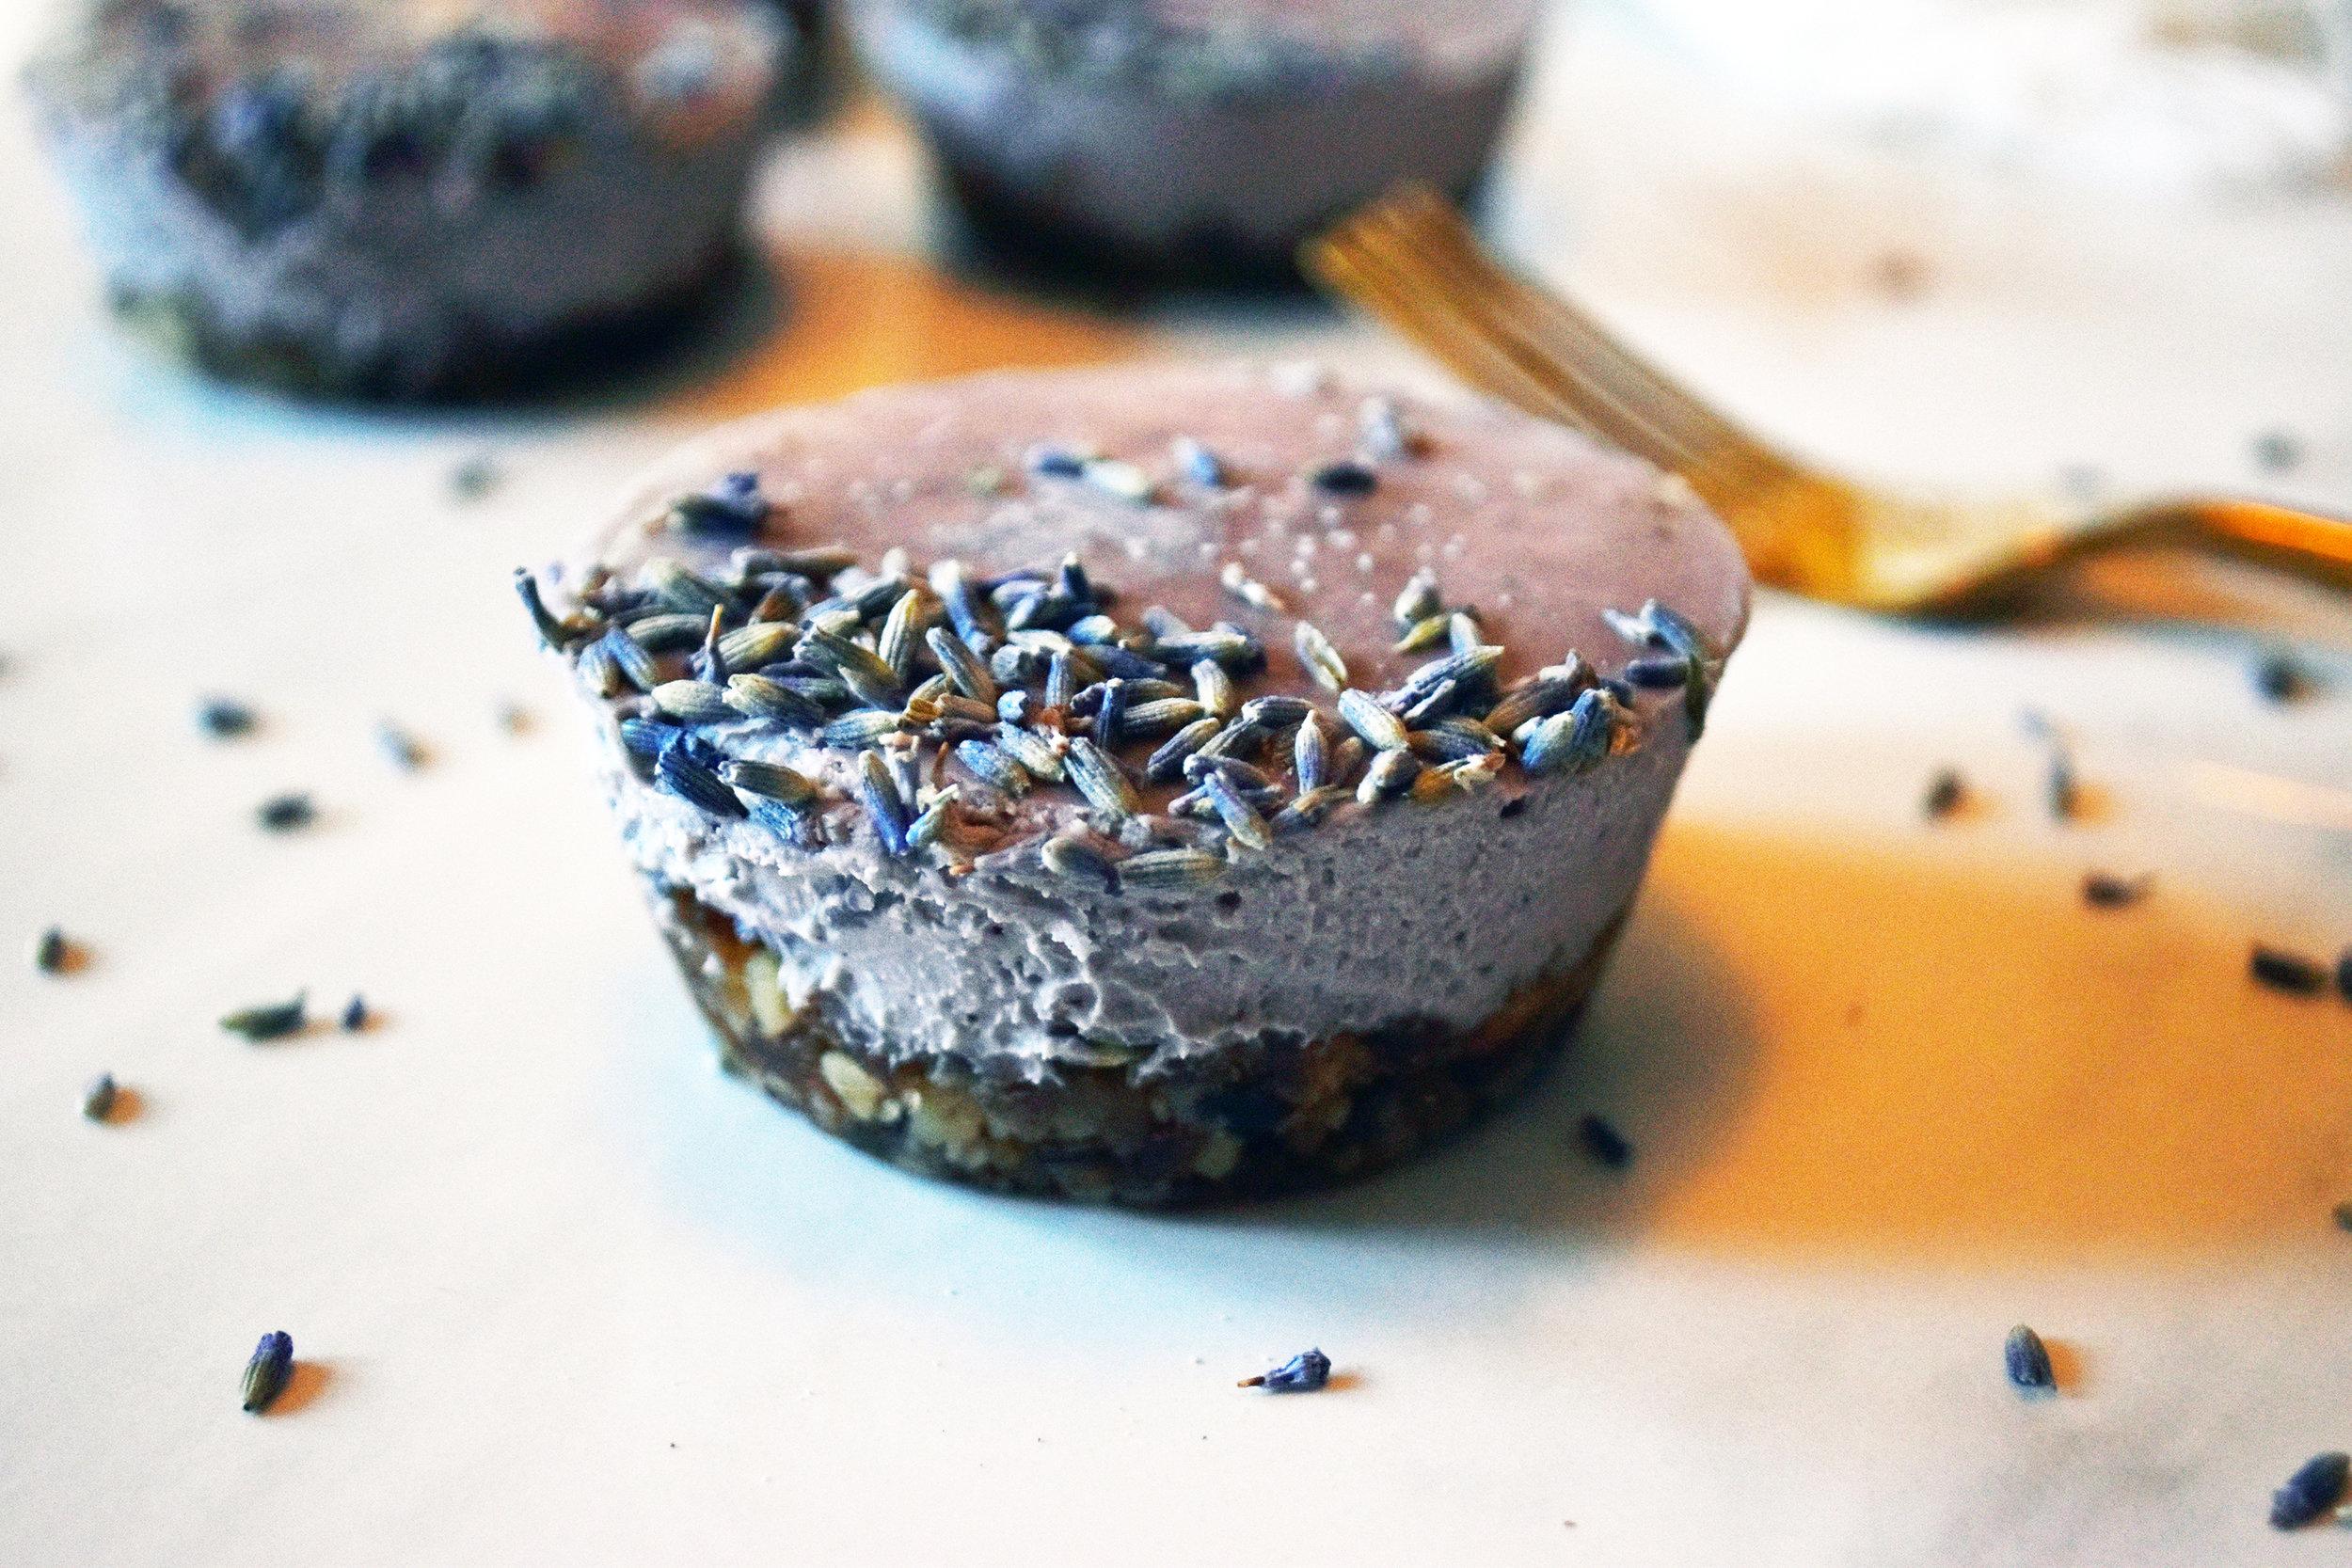 vegan lavender cheesecakes - because fancy is fun